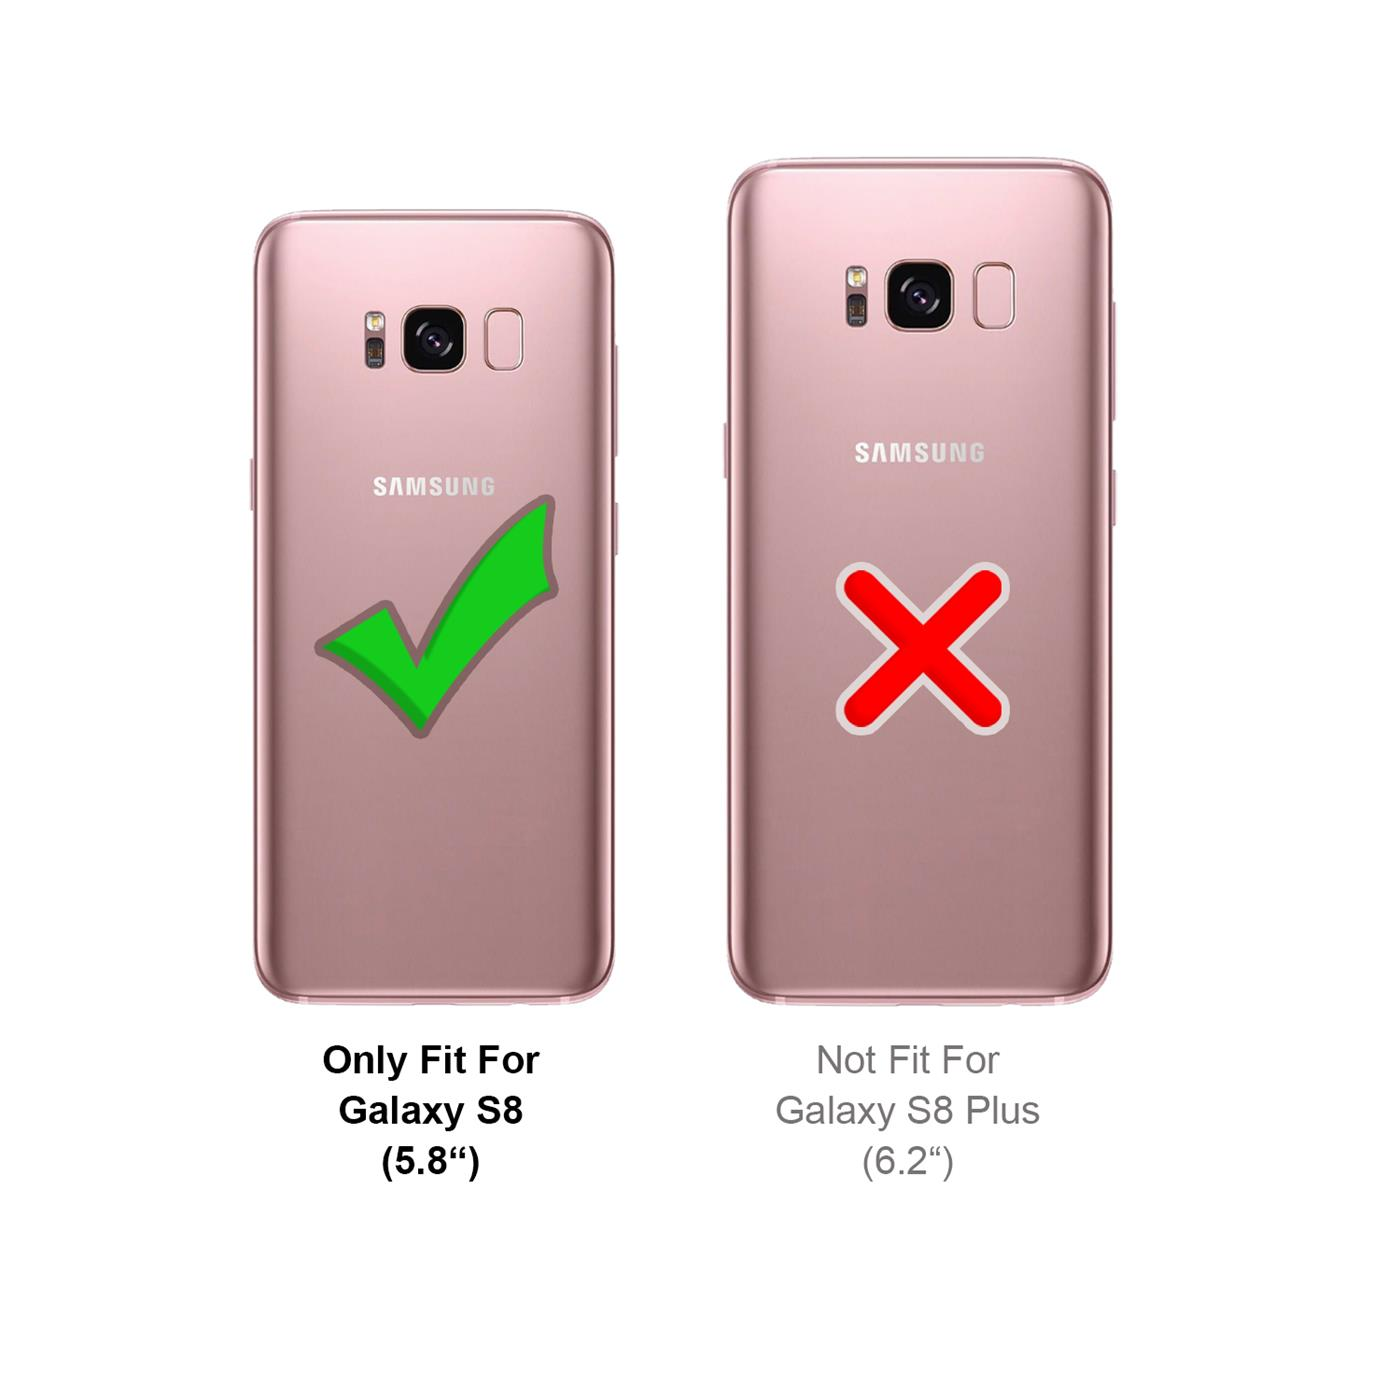 Hard-Back-Case-Cover-Samsung-Galaxy-s4-duenn-Cover-Slim-Shockproof-Rugged Indexbild 7